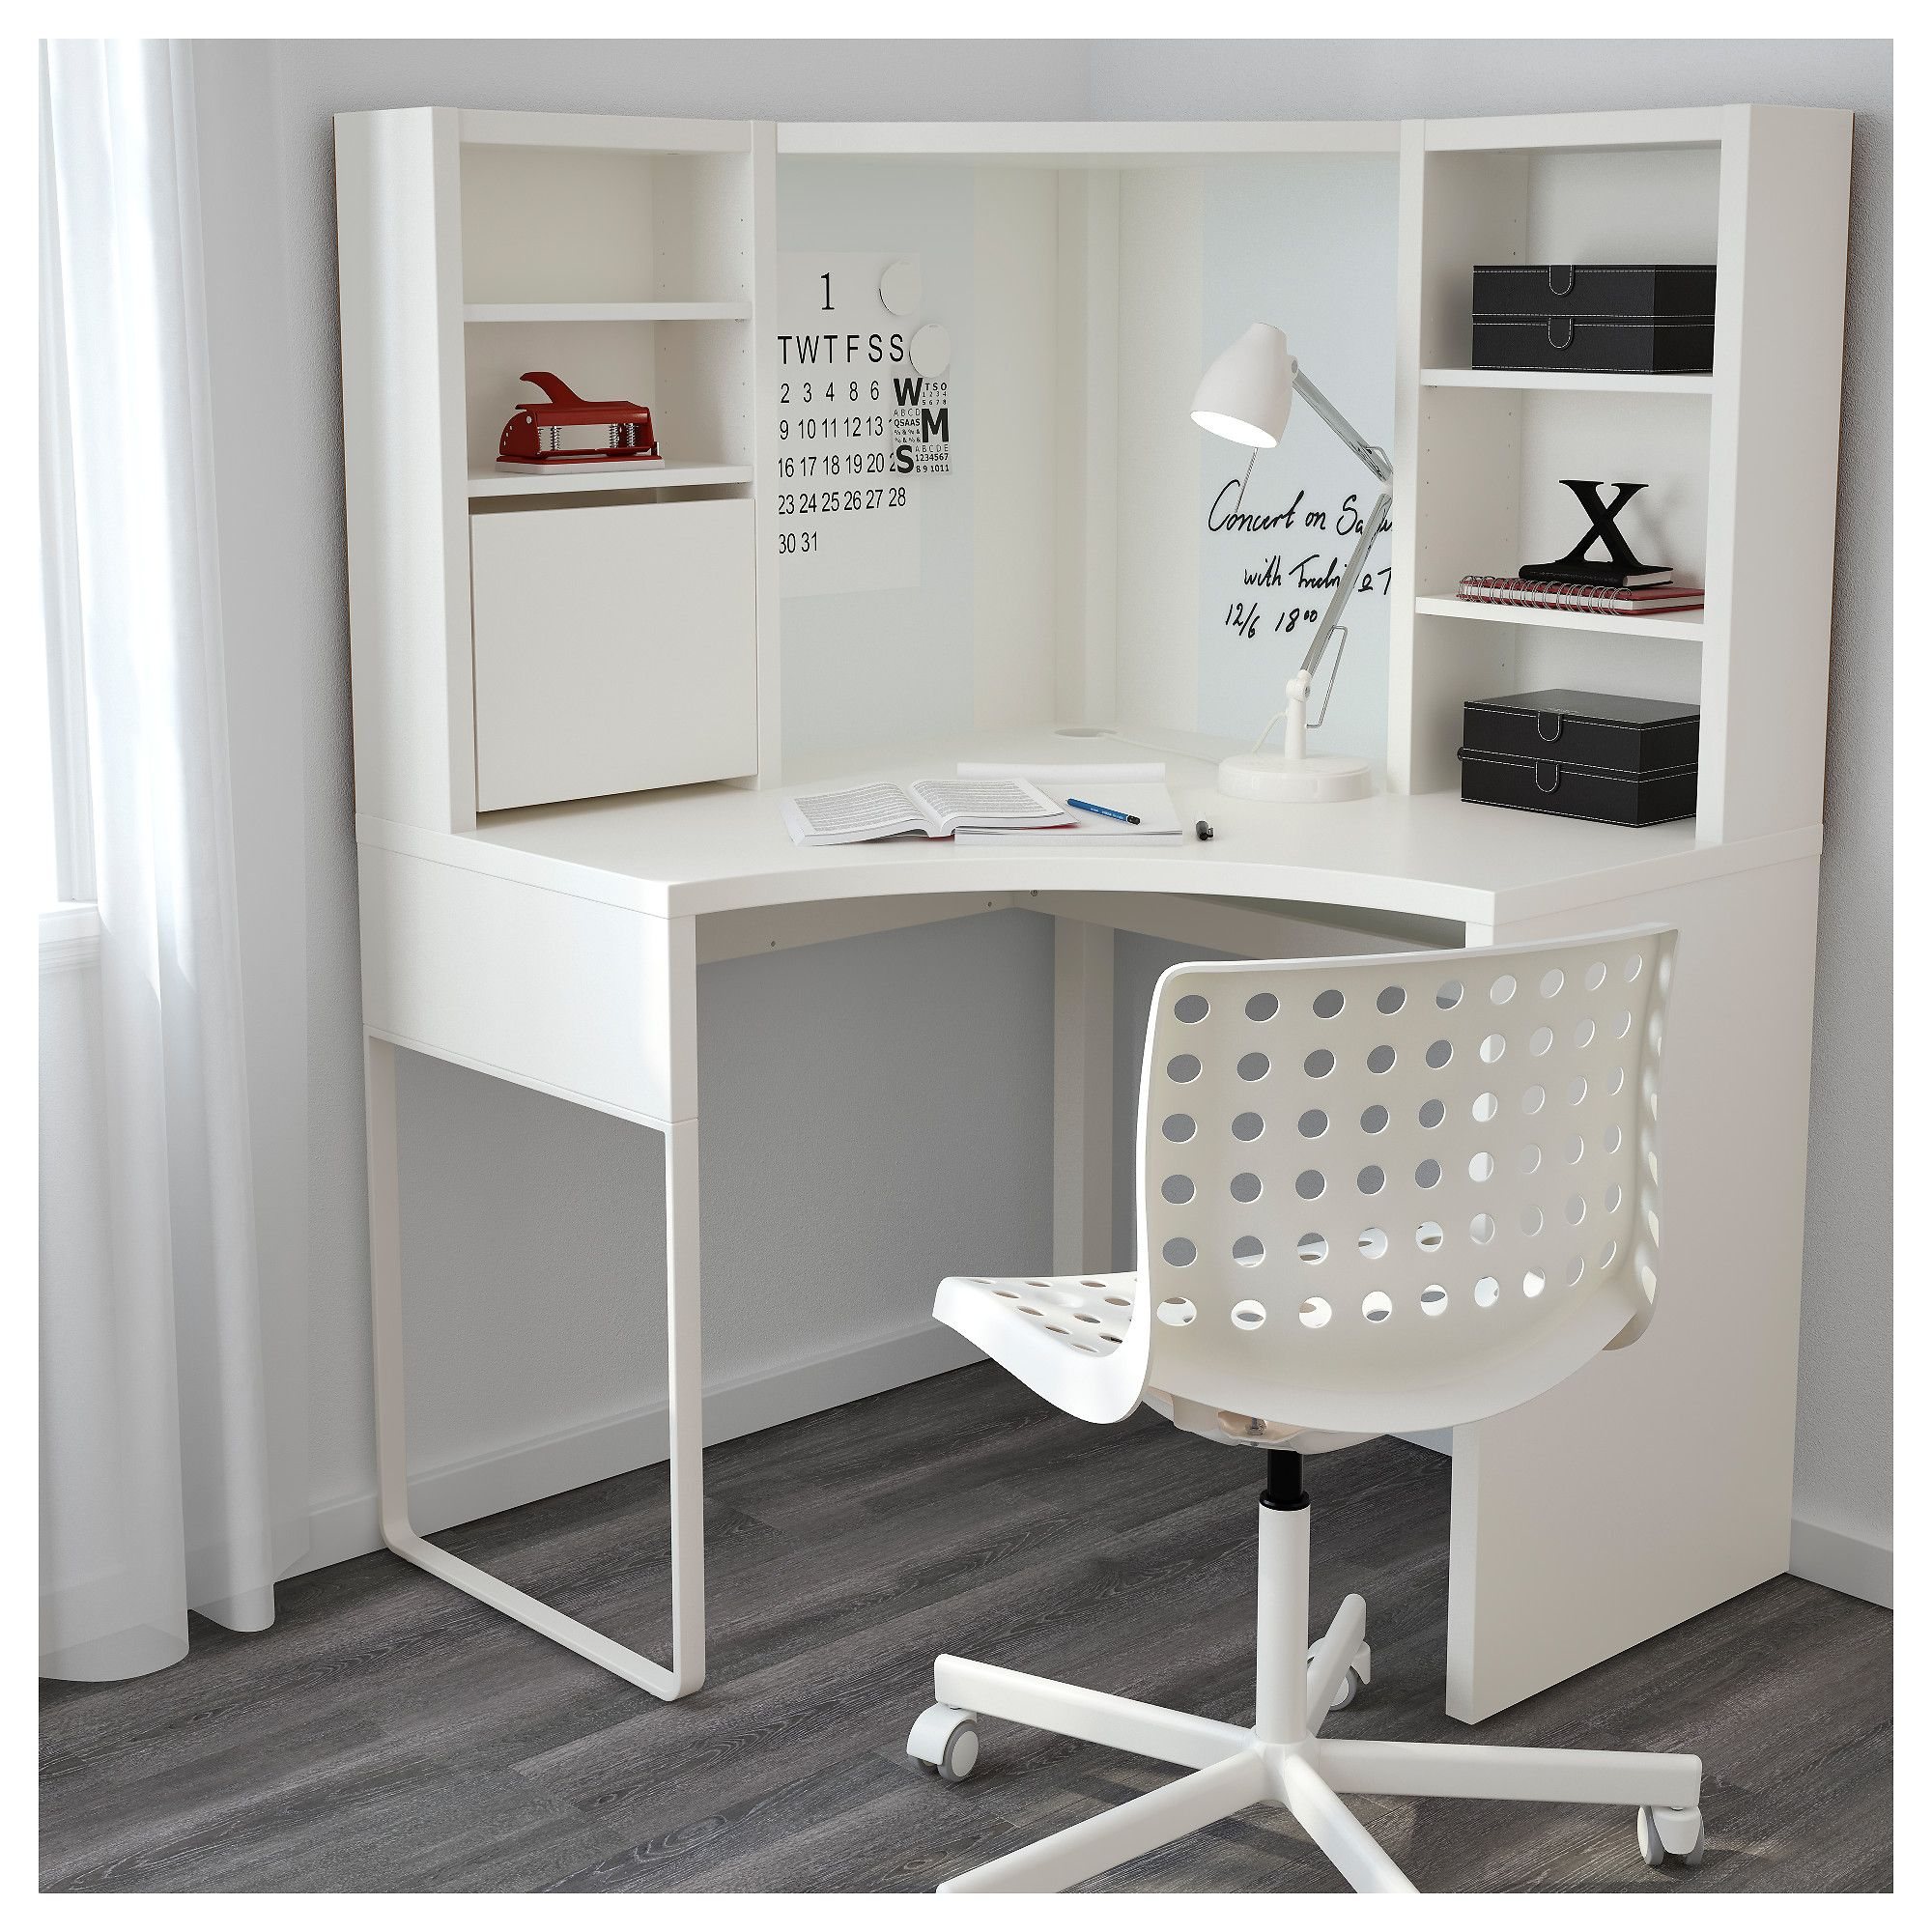 Micke White Corner Workstation 100x142 Cm Ikea Corner Workstation Home Office Furniture White Corner Desk